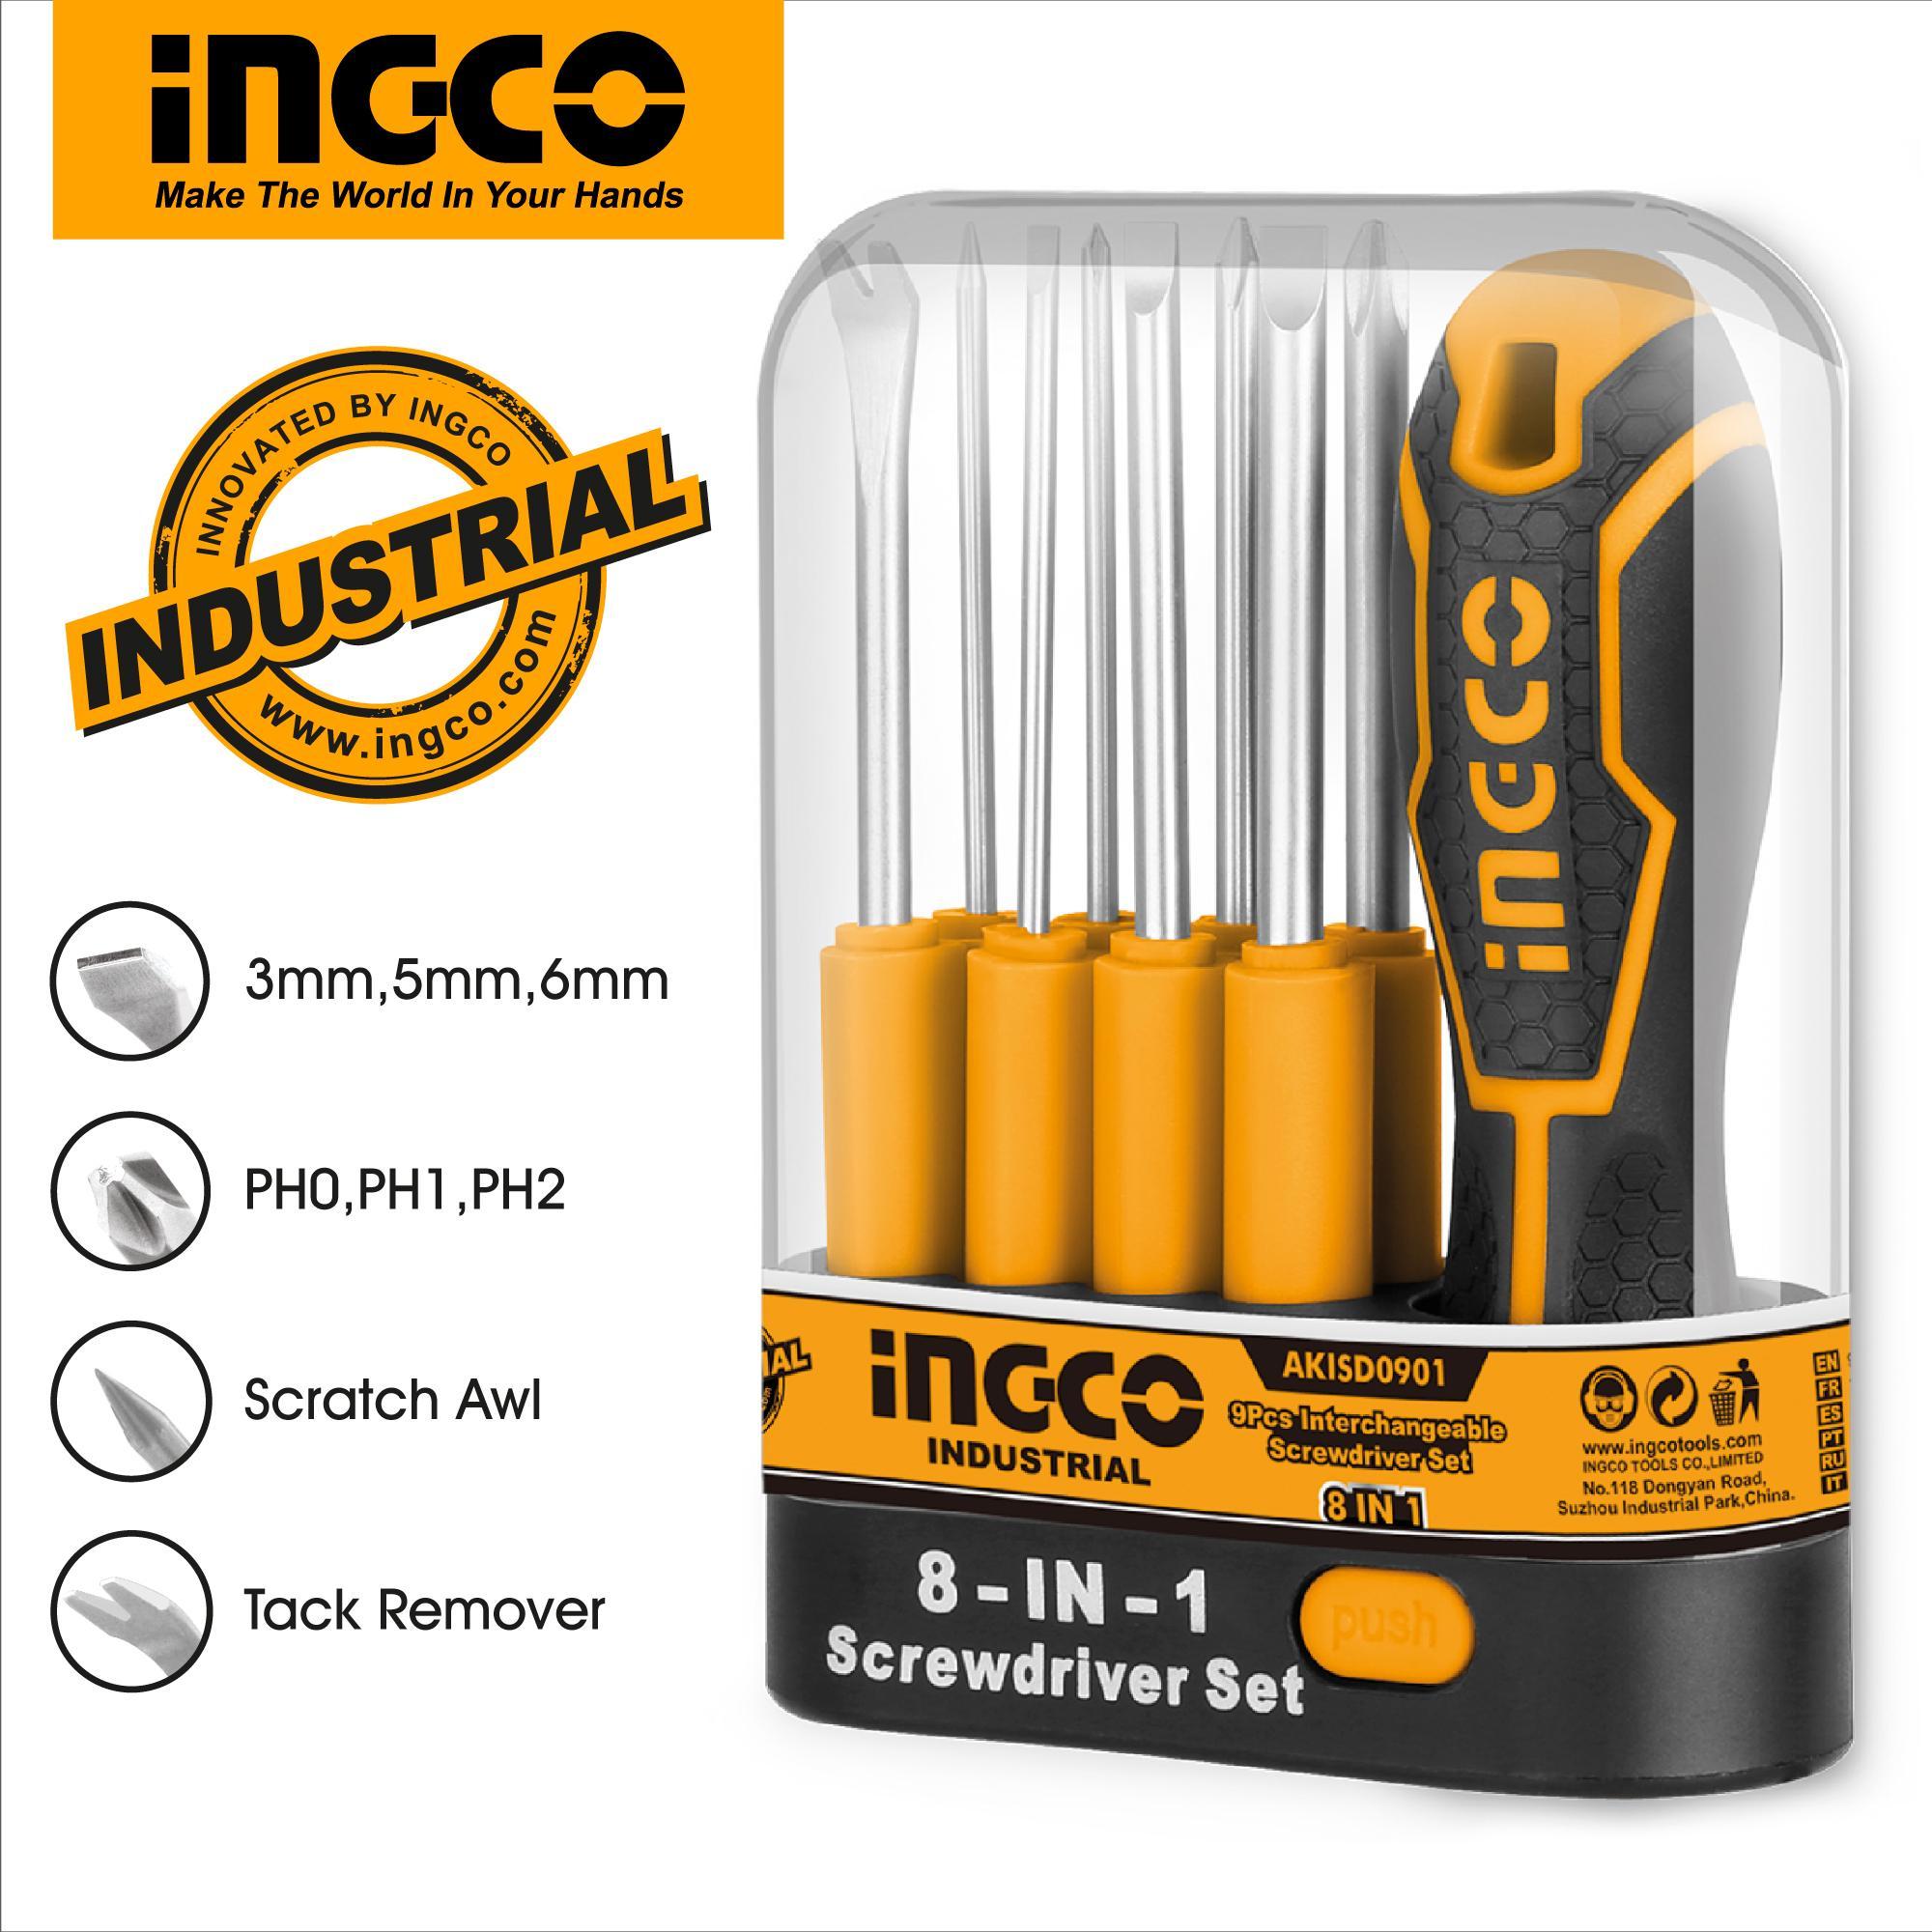 INGCO 9pcs Screwdriver Set with 1pcs Interchangeable Handle AKISD0901